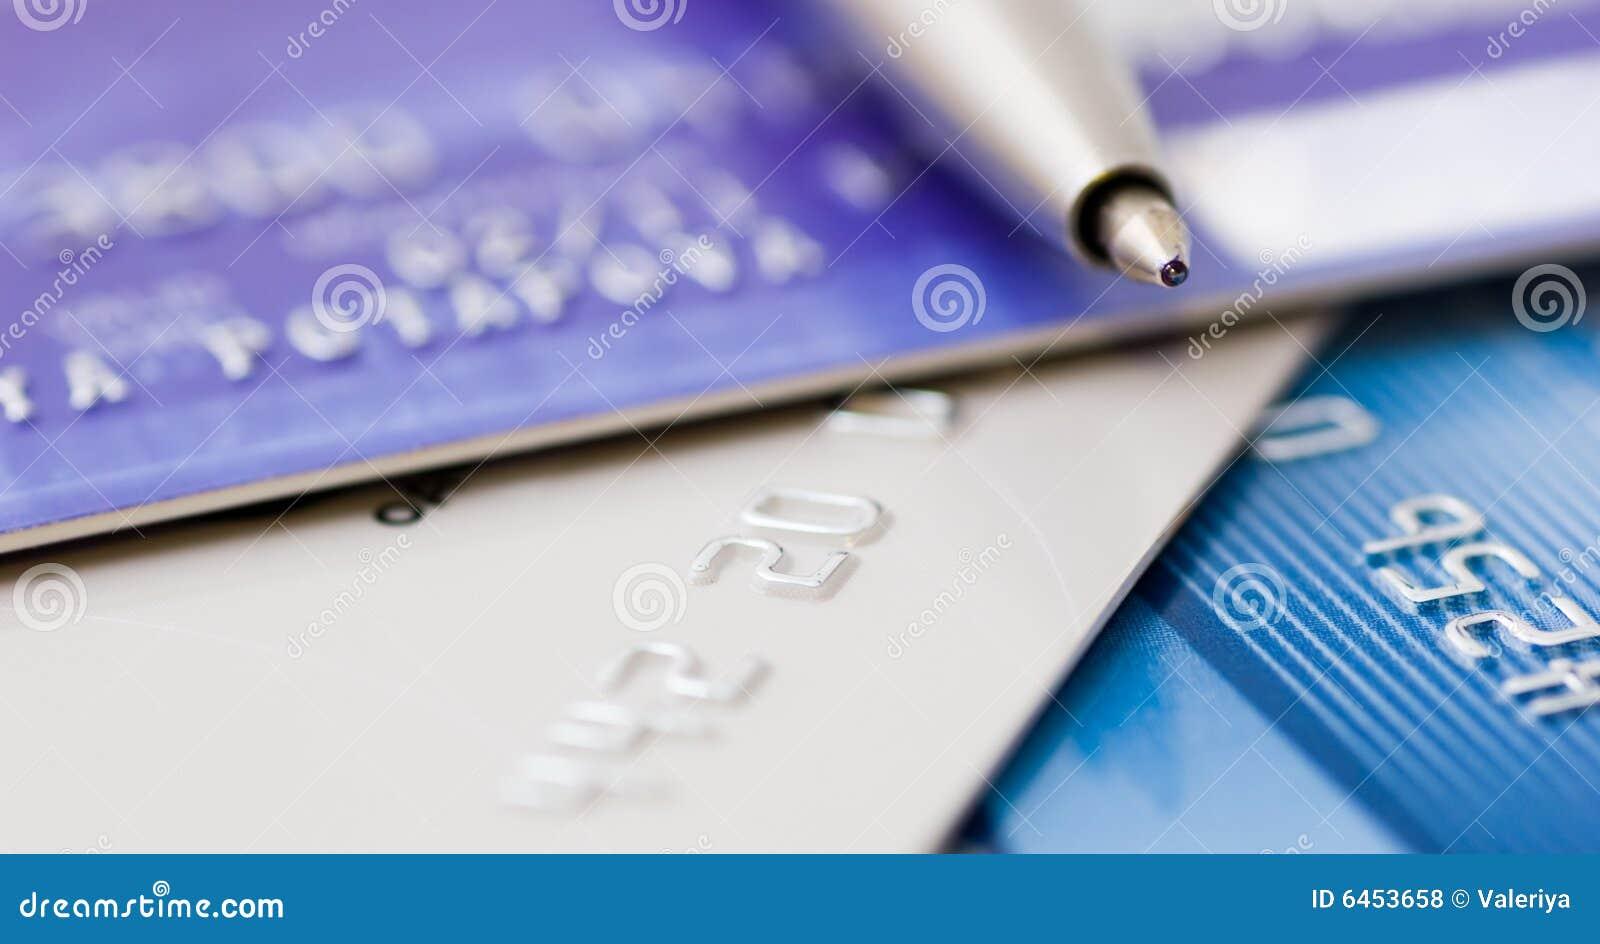 Kredyt karty nad piórem